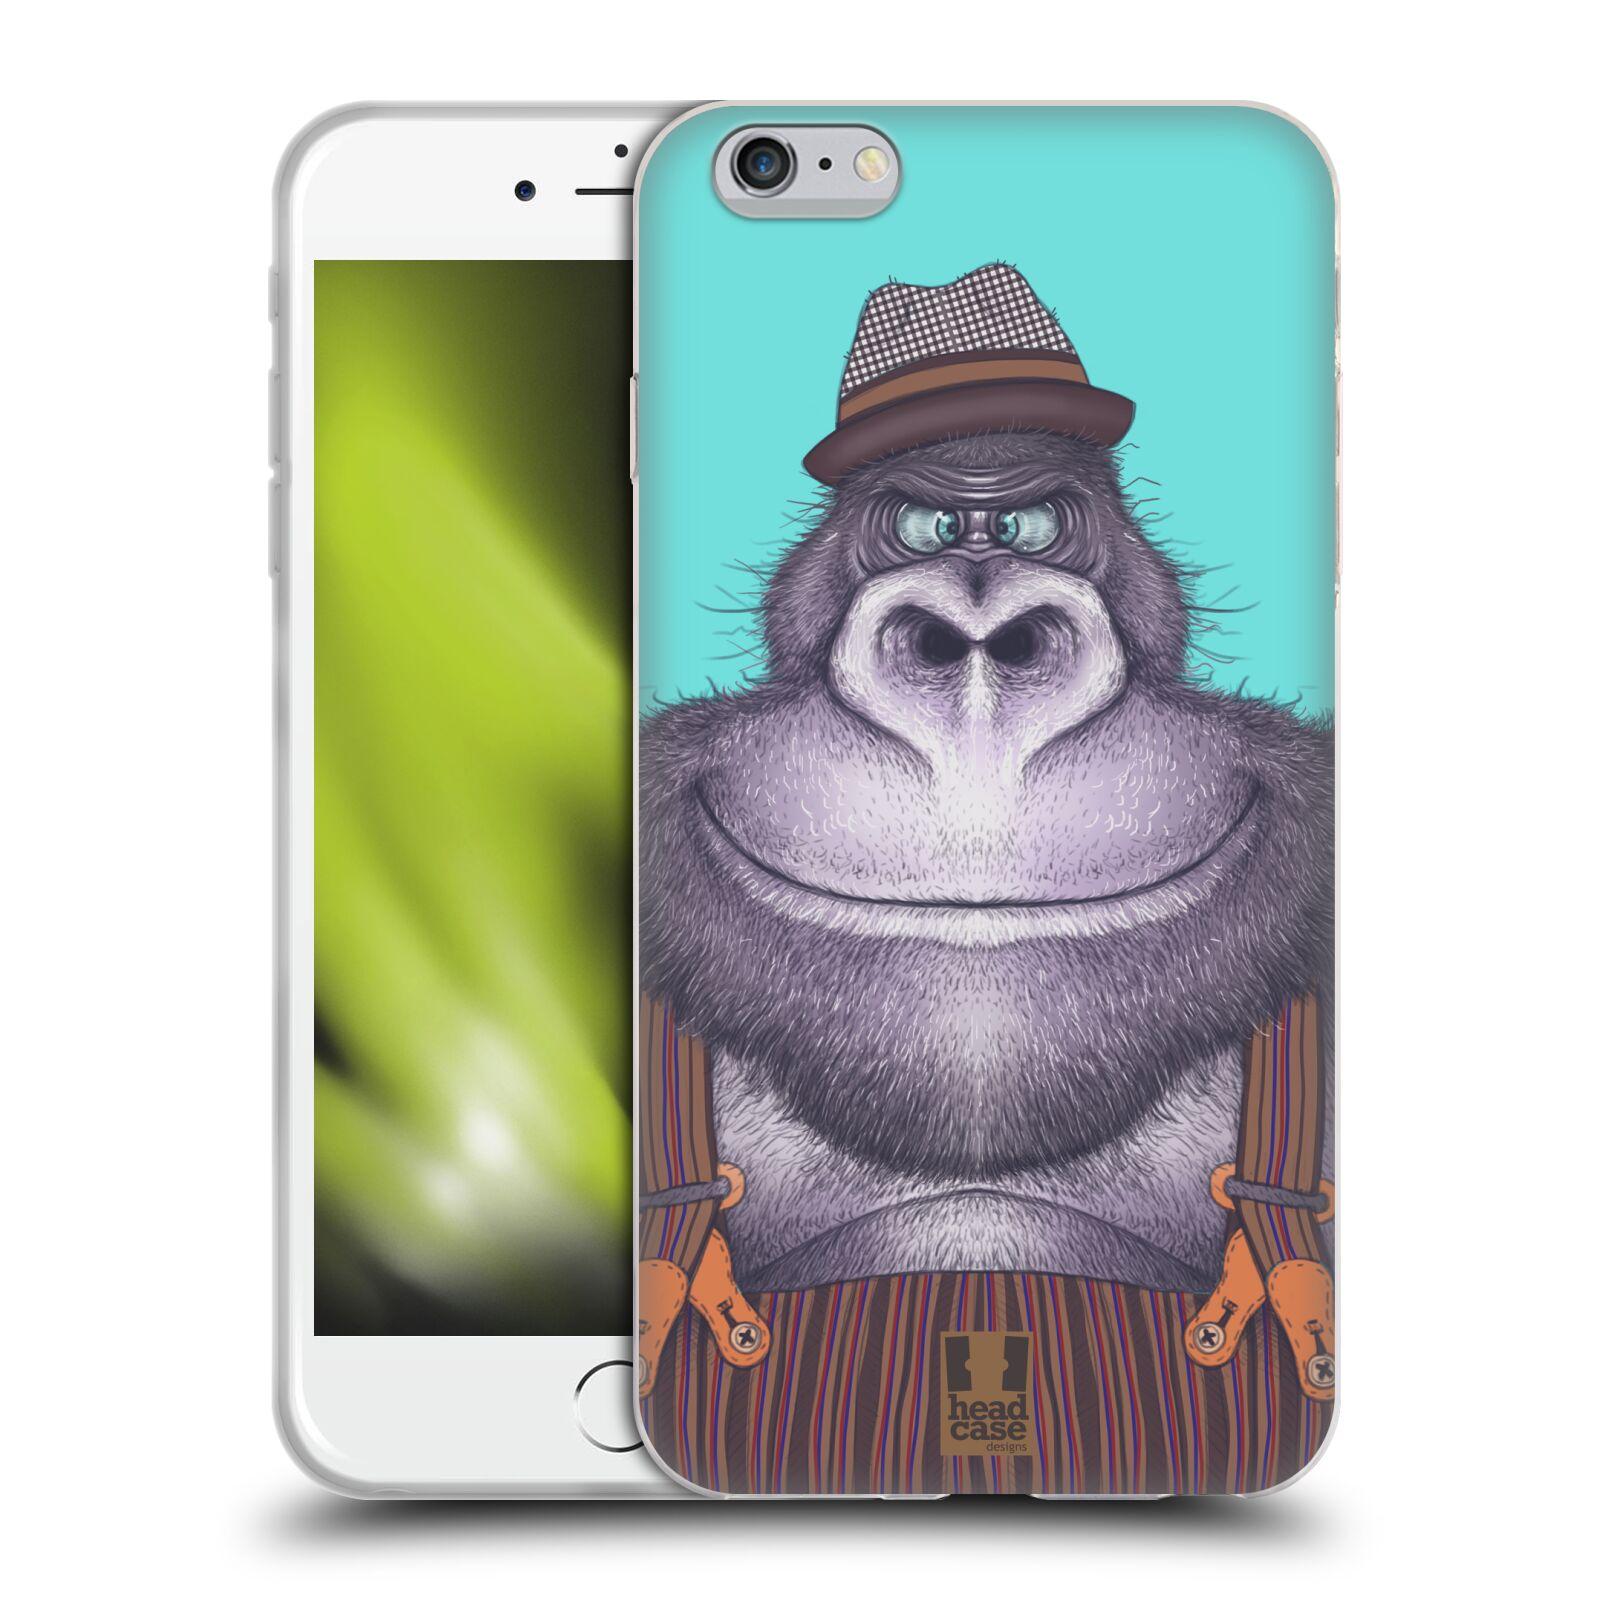 HEAD CASE silikonový obal na mobil Apple Iphone 6 PLUS/ 6S PLUS vzor Kreslená zvířátka gorila